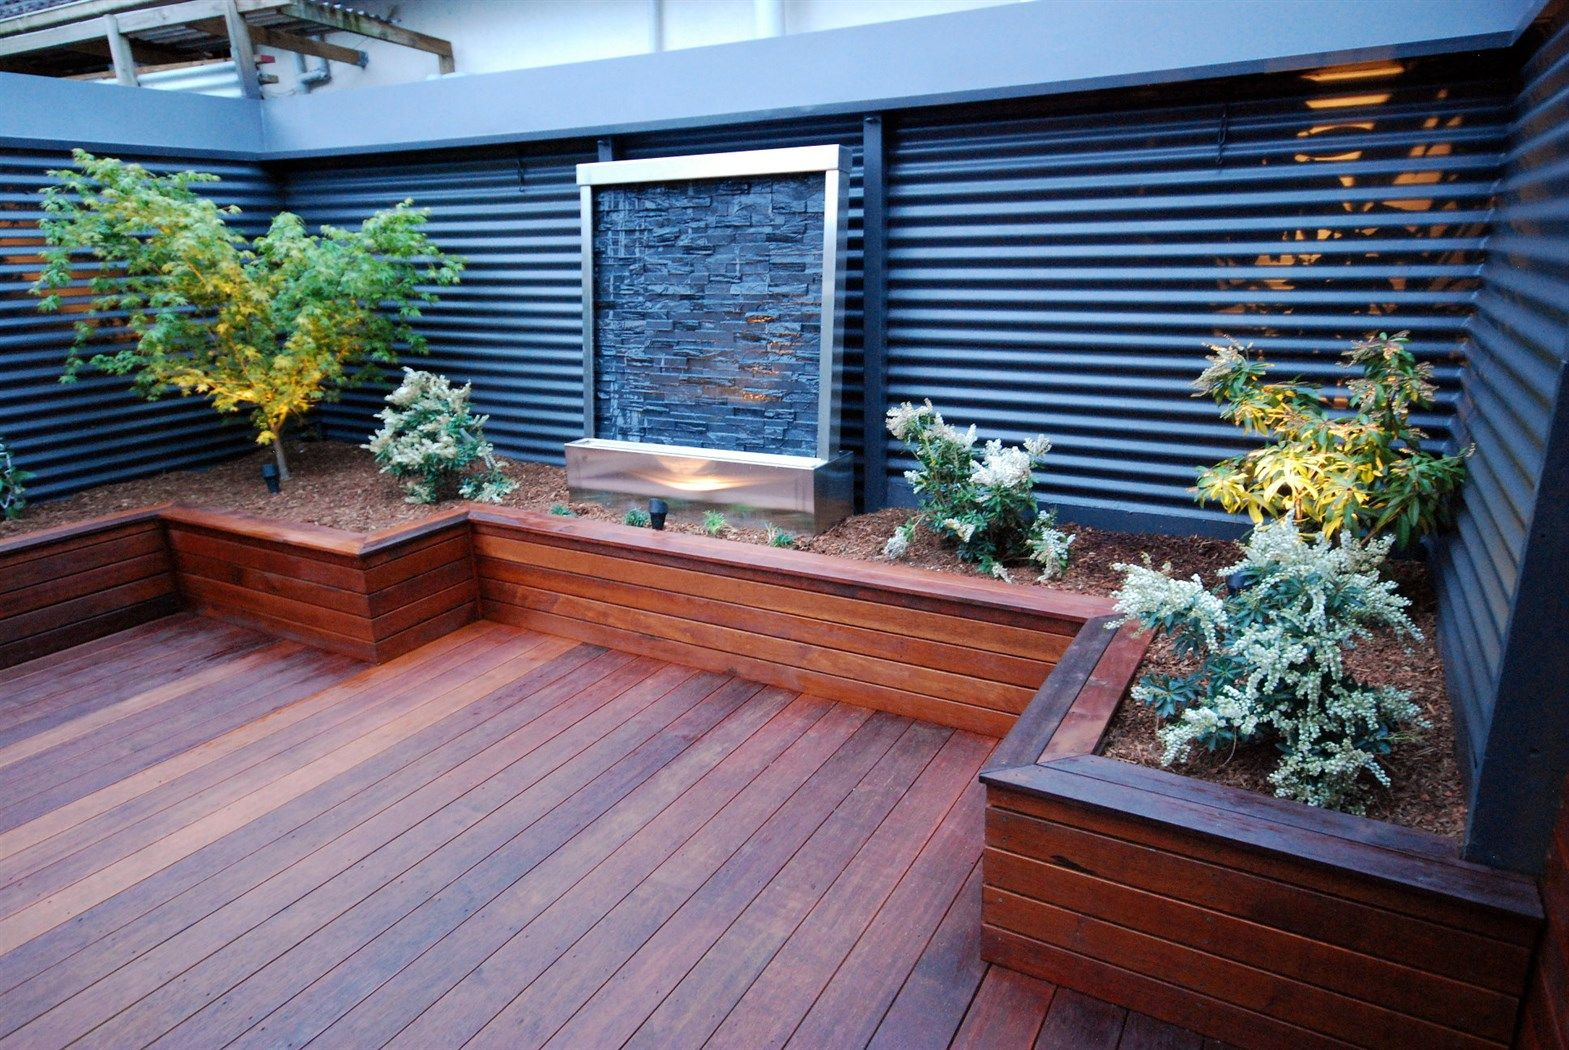 Merbau Deck With Wall Jpg Small Backyard Decks Deck Designs Backyard Decks Backyard